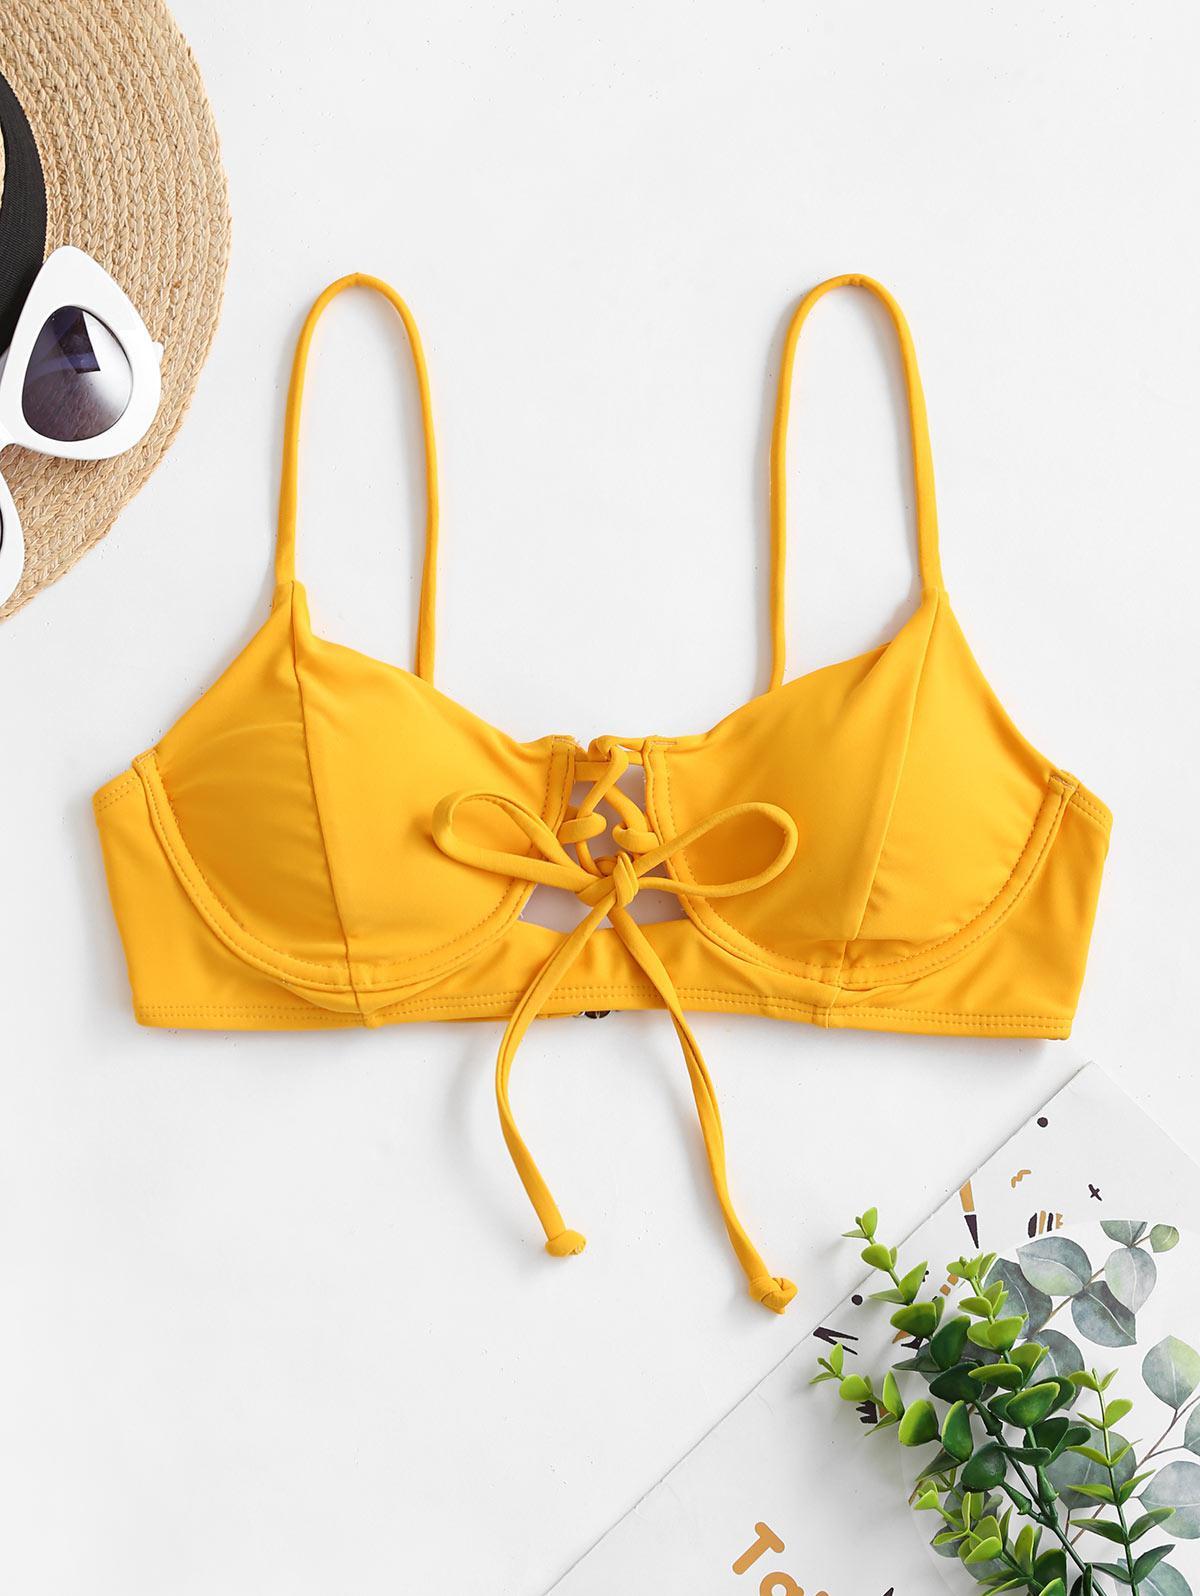 ZAFUL Lace Up Tie Underwire Bikini Top фото